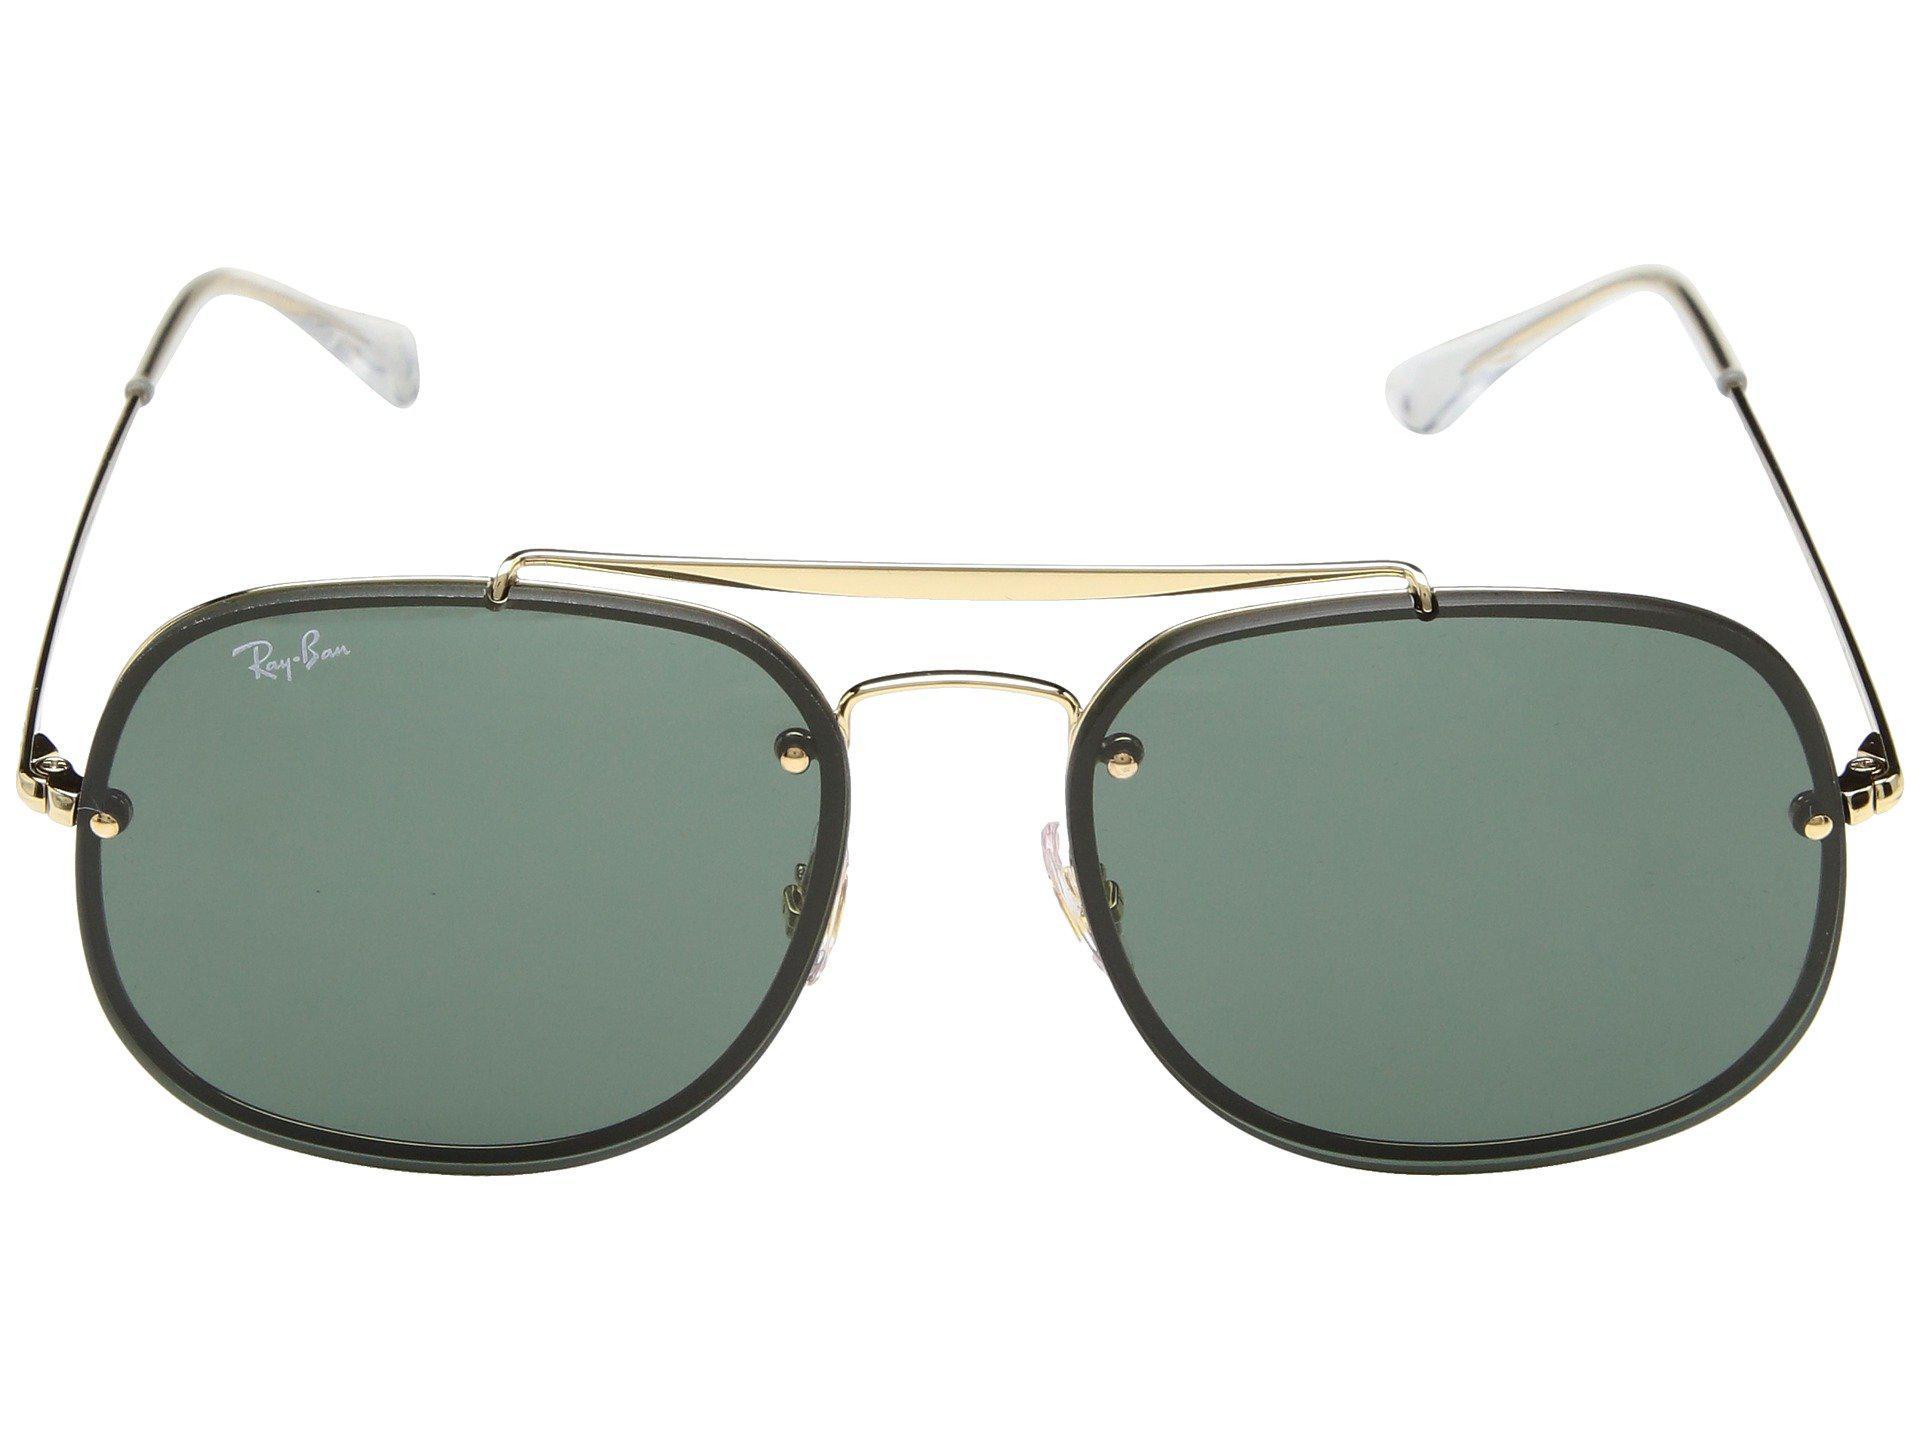 1a500a0afa Ray-Ban - Green Blaze General Rb3583n 58mm (gunmetal brown Gradient) Fashion.  View fullscreen